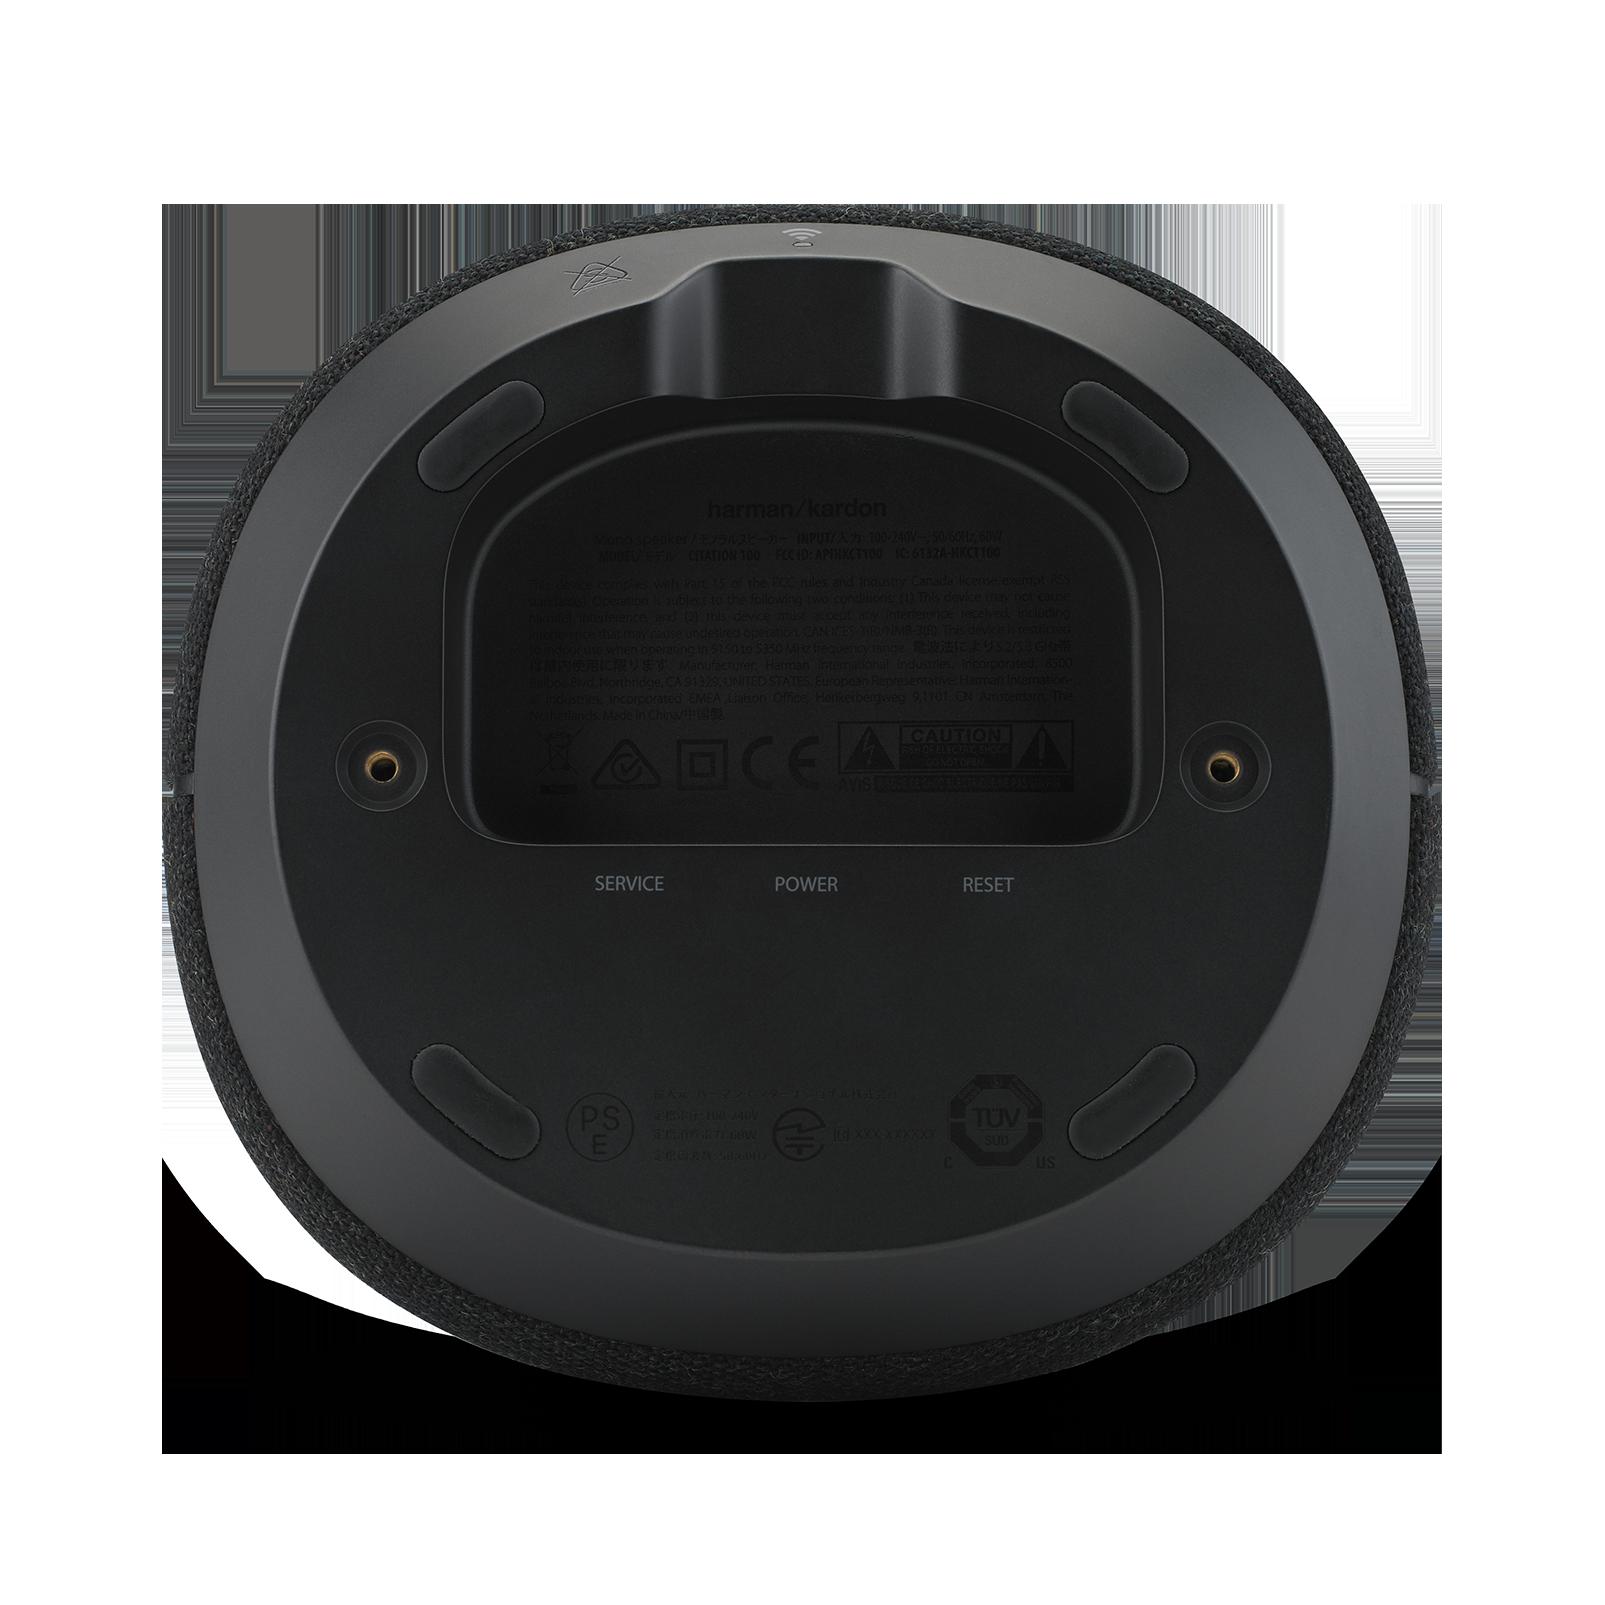 Harman Kardon Citation 100 - Black - The smallest, smartest home speaker with impactful sound - Detailshot 3